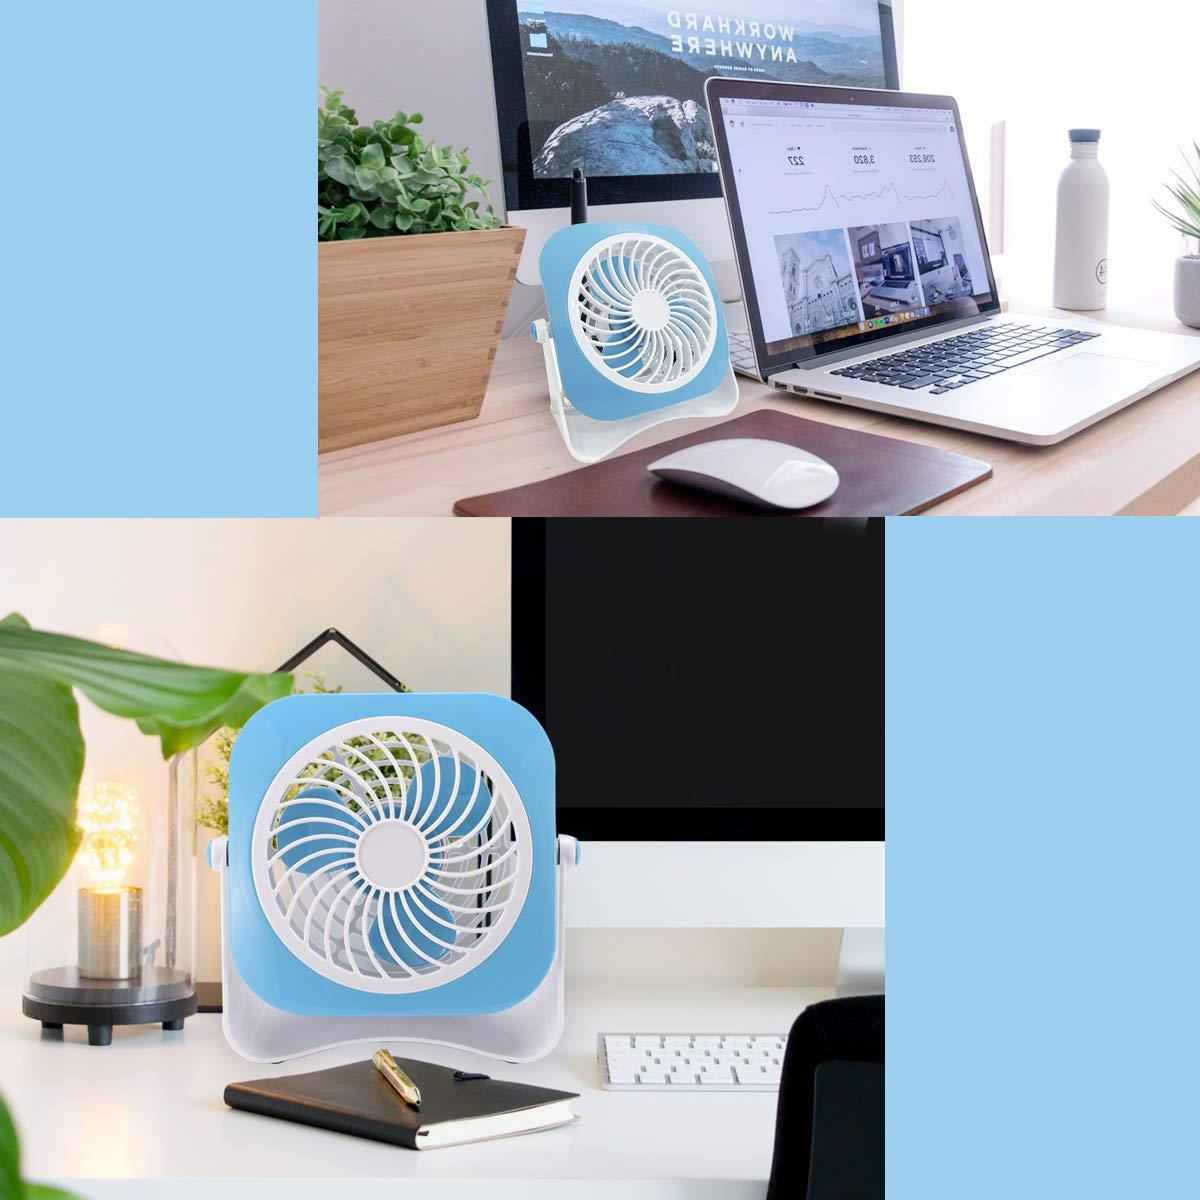 4 inch AirArtDeco Mini Ventilateur de Bureau USB 10 cm Mini Ventilateur de Table 10 CM Petit Ventilateur 2 Vitesses et 5 Lames Ventilateur de Table Bleu//Blanc 2.50watts